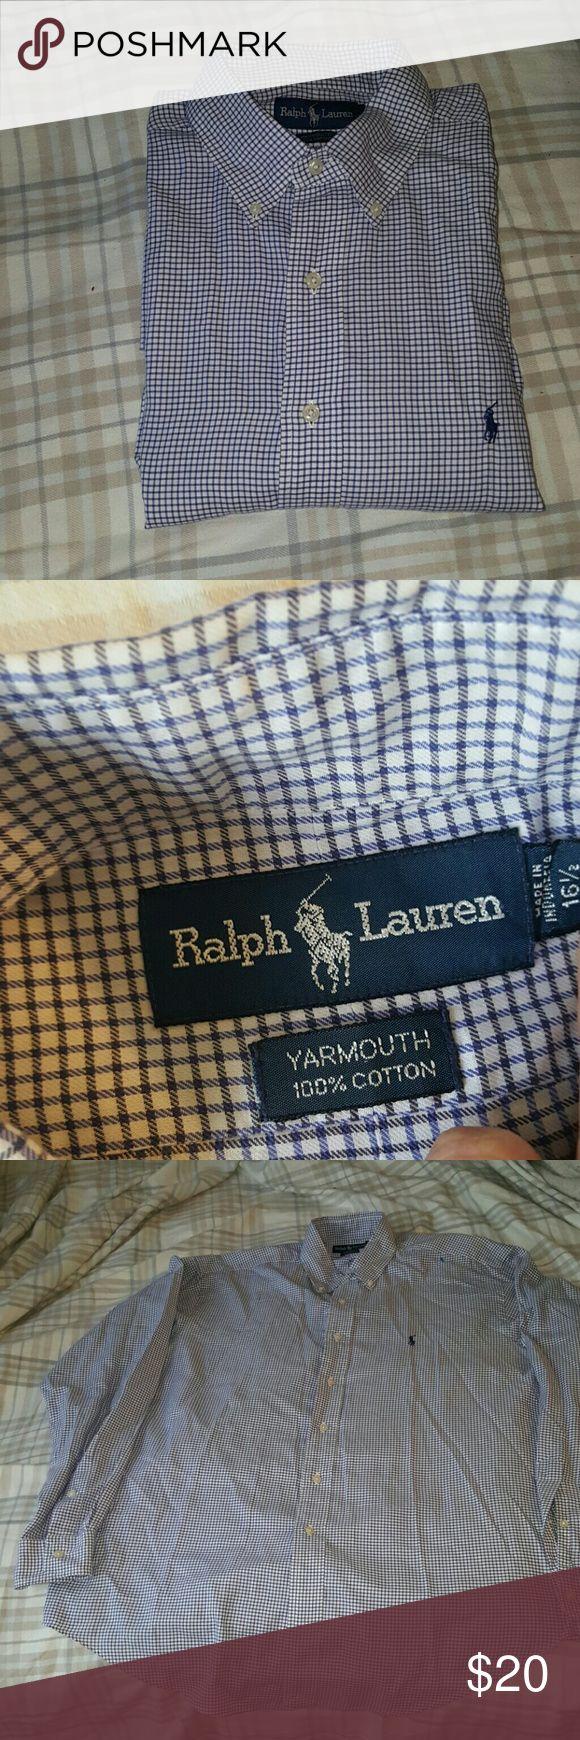 RALPH LAUREN YARMOUTH COTTON POLO SHIRT 16.5 POLO RALPH LAUREN YARMOUTH 16.5 36/37 CHECK PRINT BLUE BUTTON DOWN  DRESS SHIRT Polo by Ralph Lauren Shirts Dress Shirts